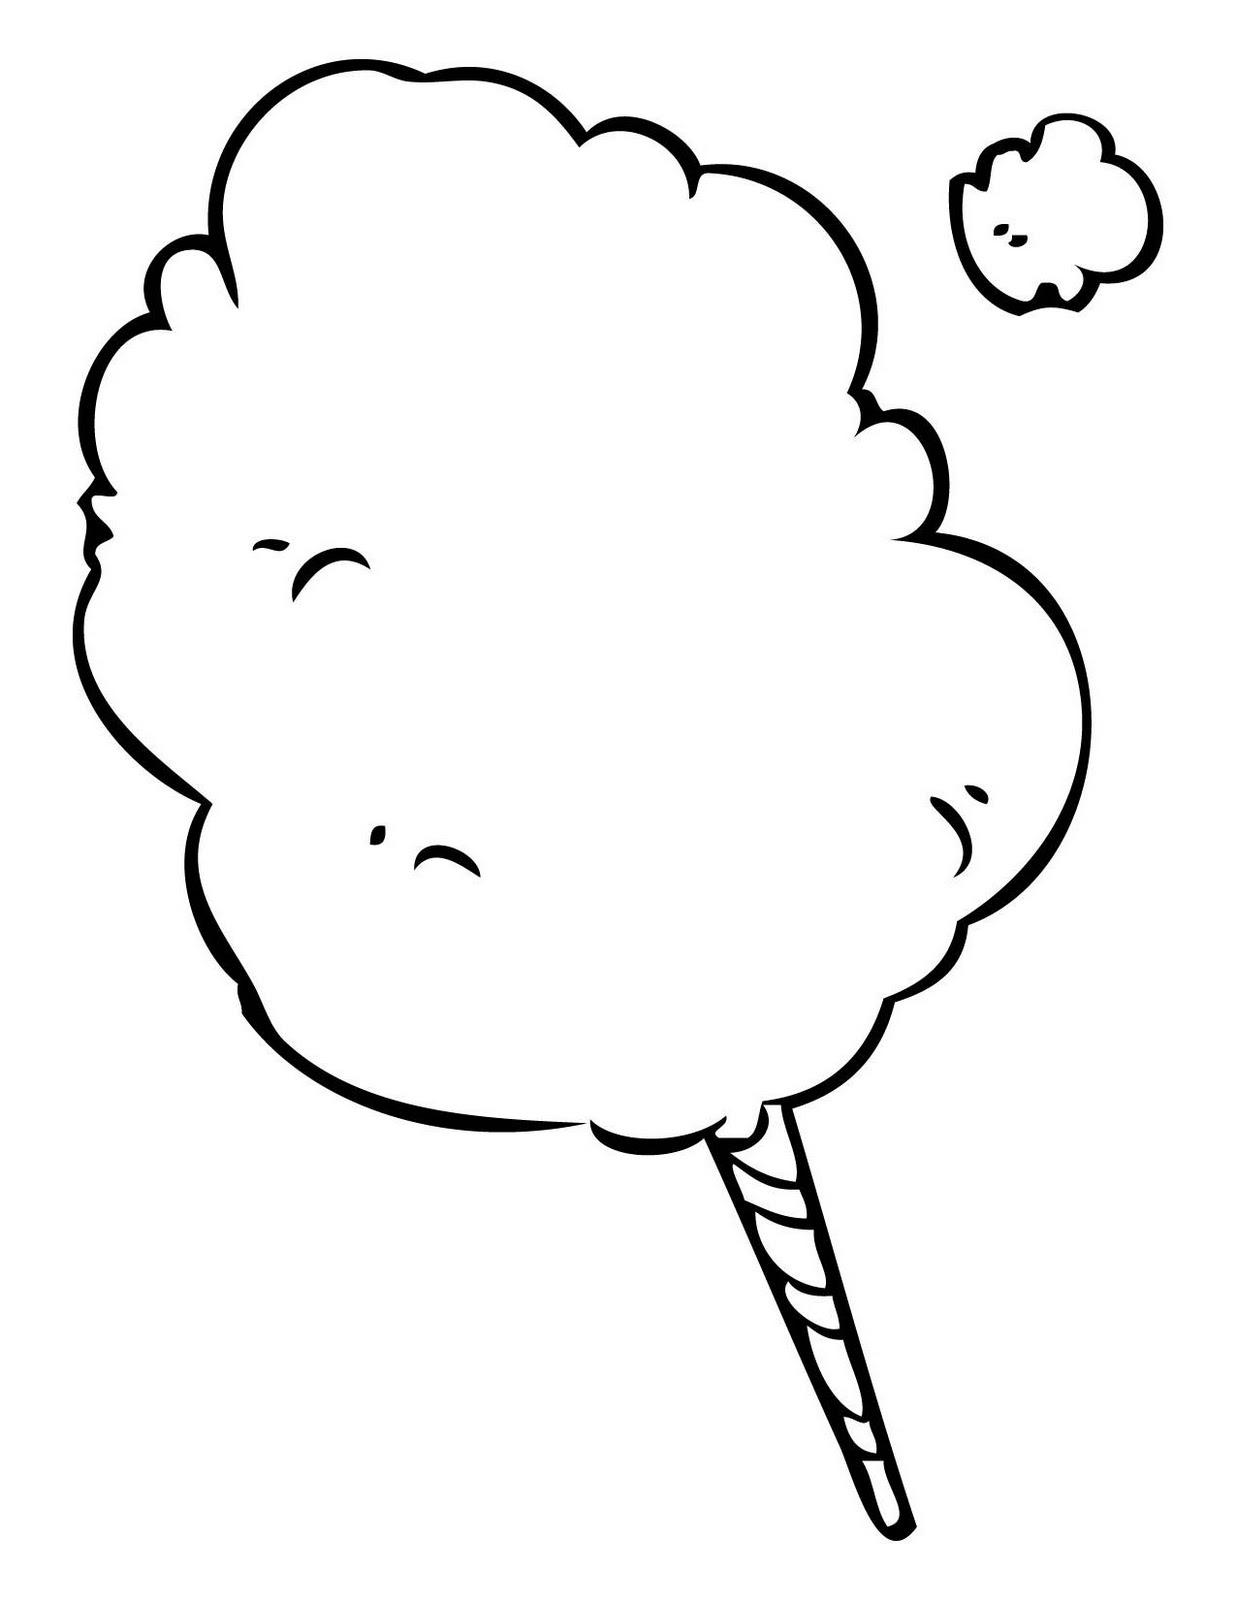 1236x1600 Candy Cane Clipart Cotton